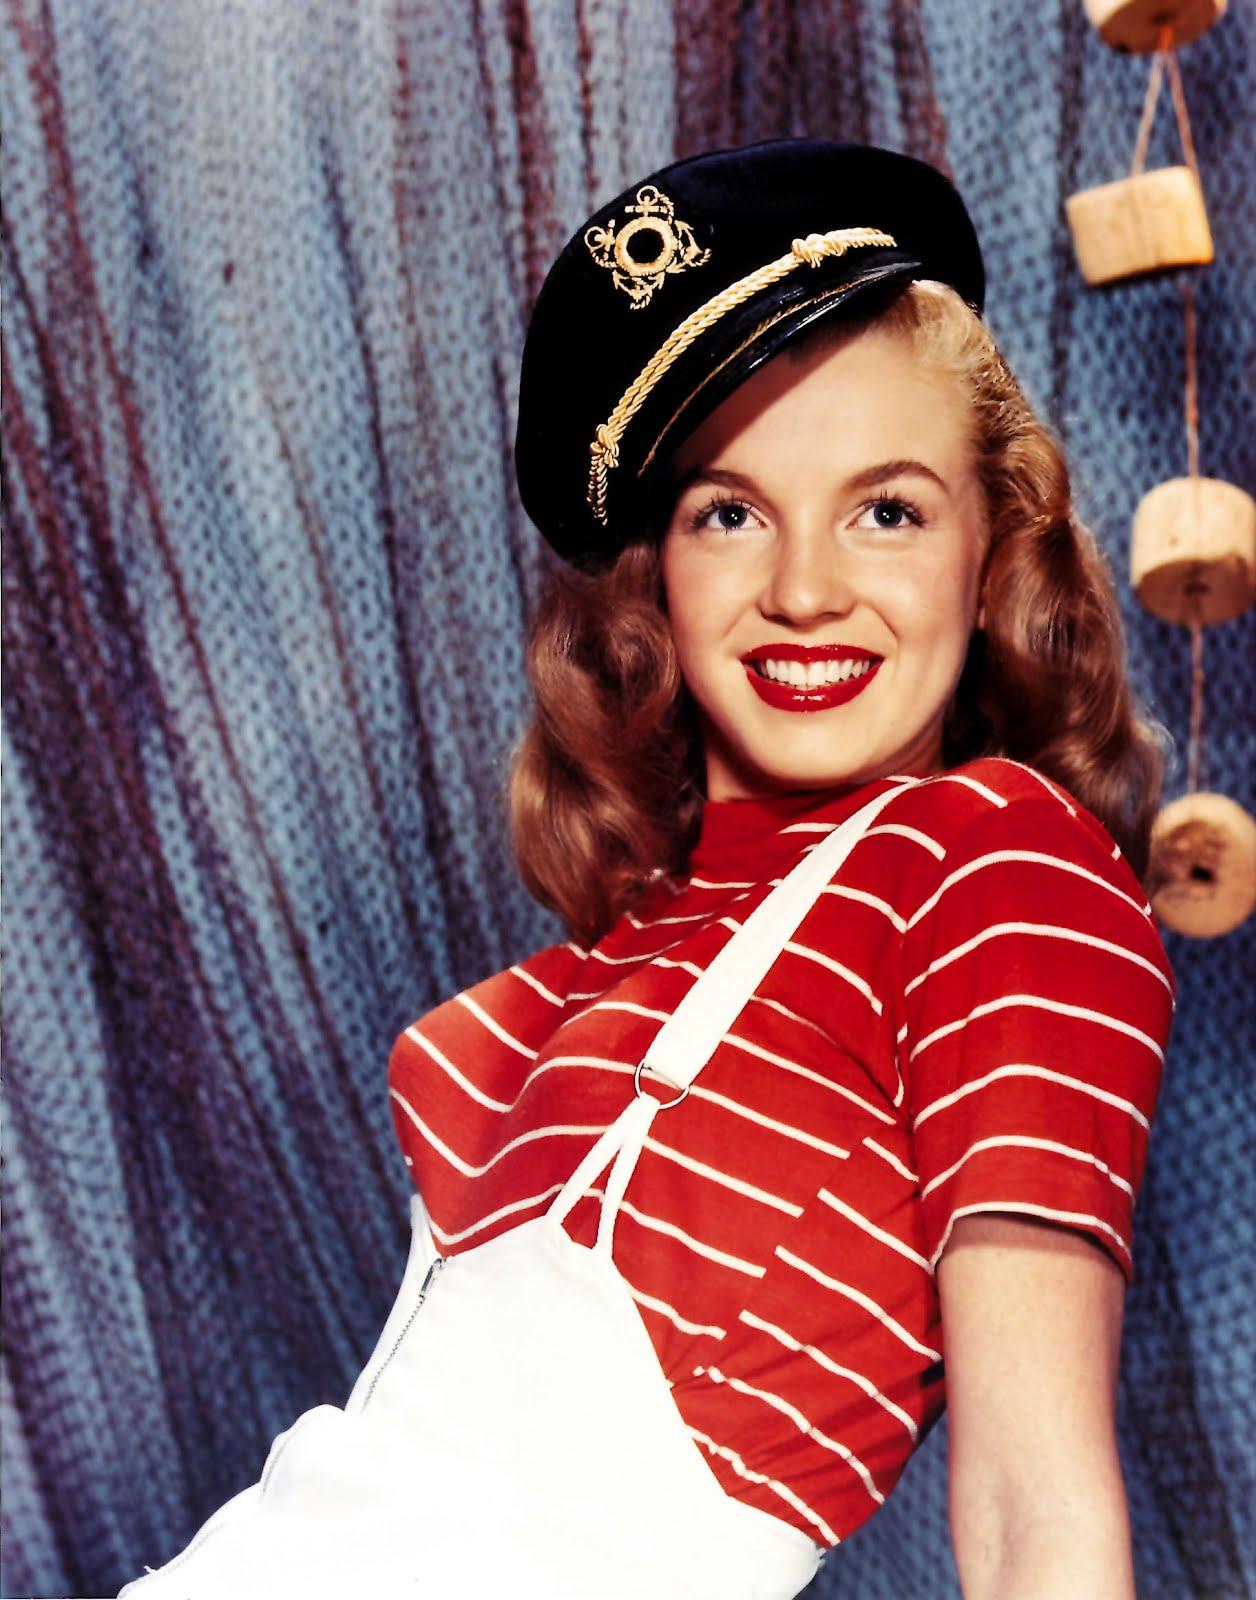 http://1.bp.blogspot.com/-r9mEzFvDP2U/TzZj4JbsA2I/AAAAAAAAMvg/D4hzV3Q_v_0/s1600/Marilyn-Monroe.jpg